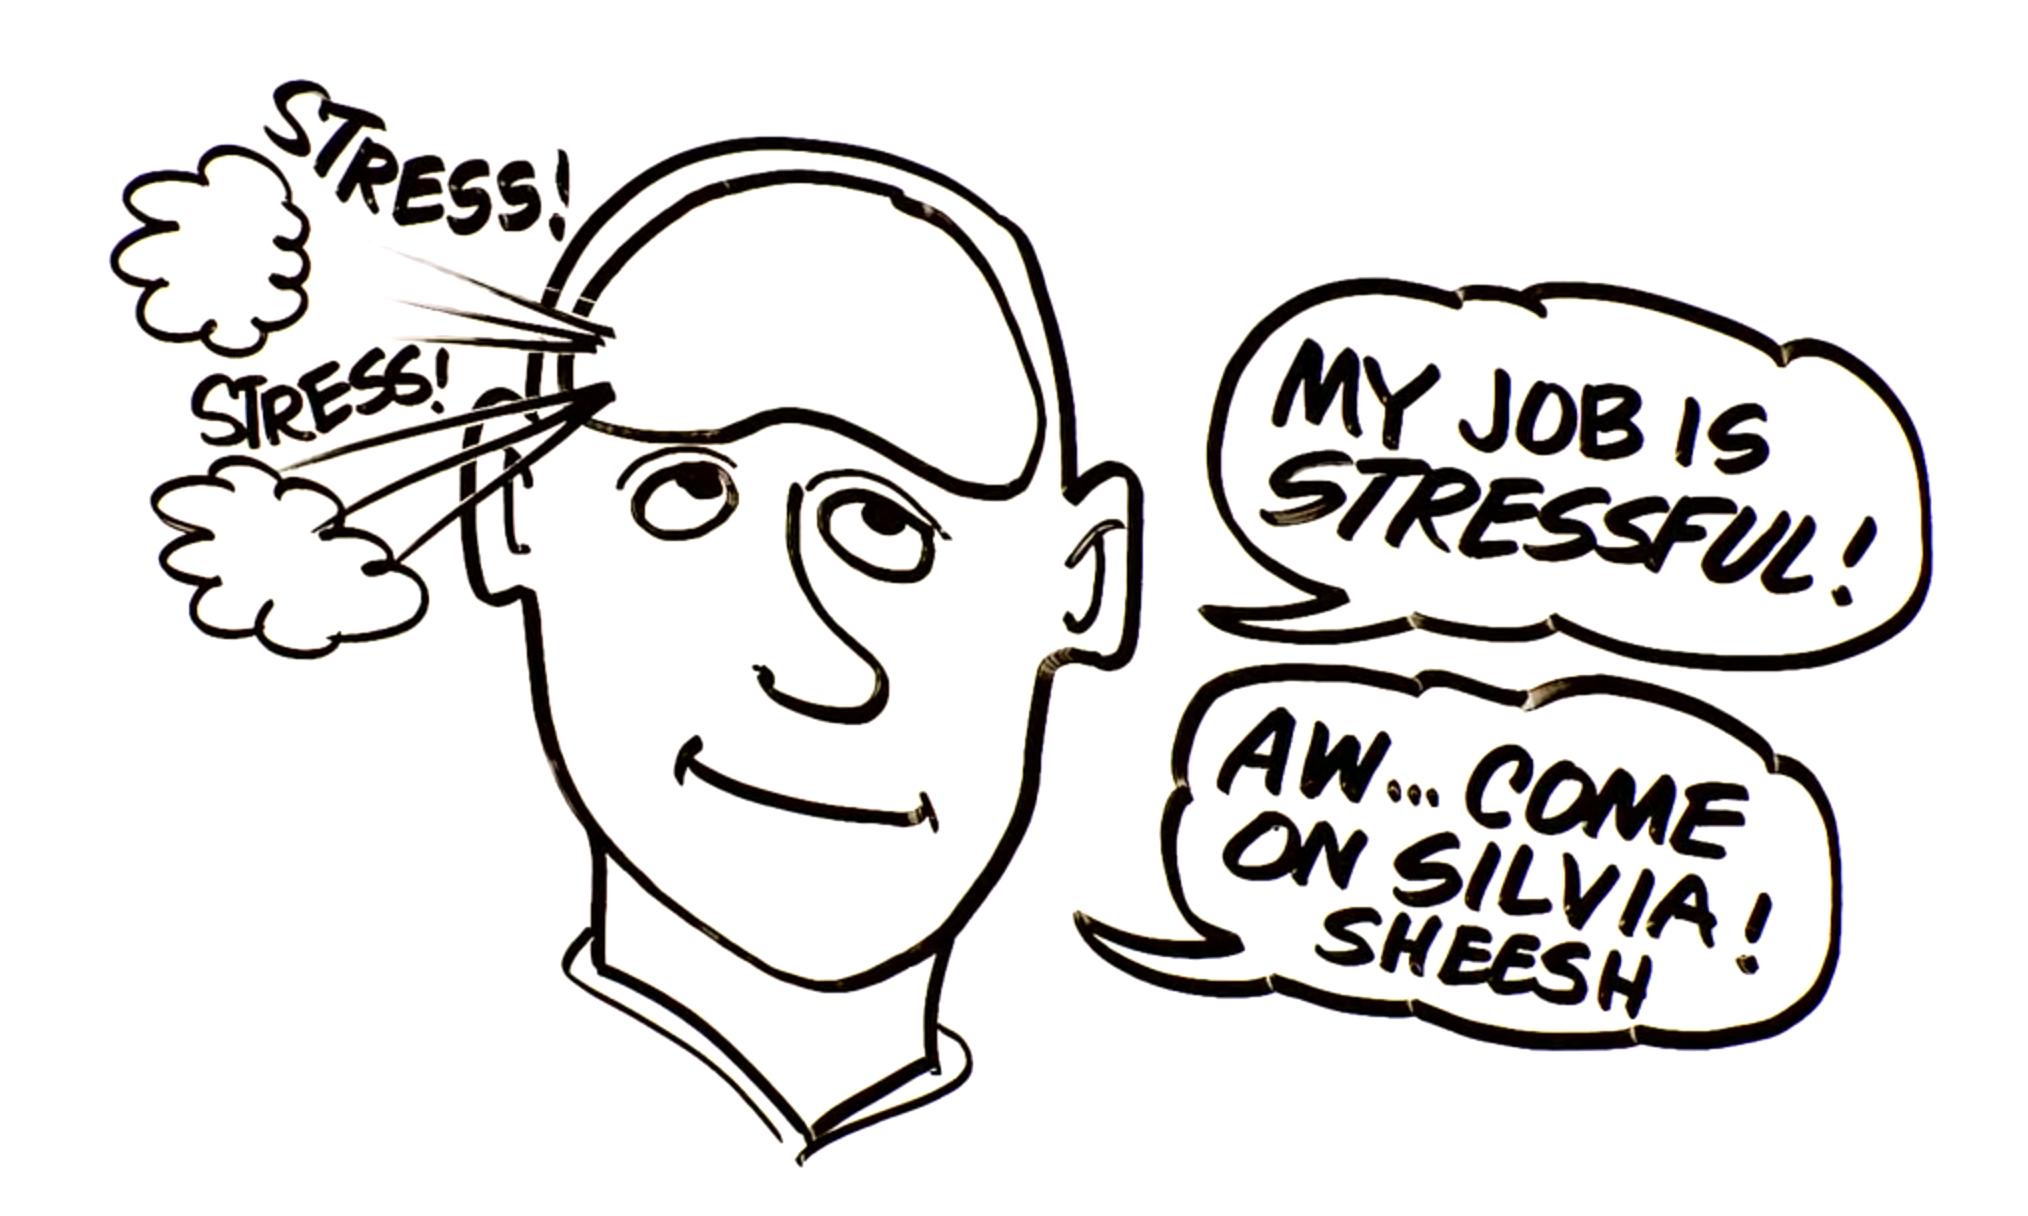 90:10 Stress